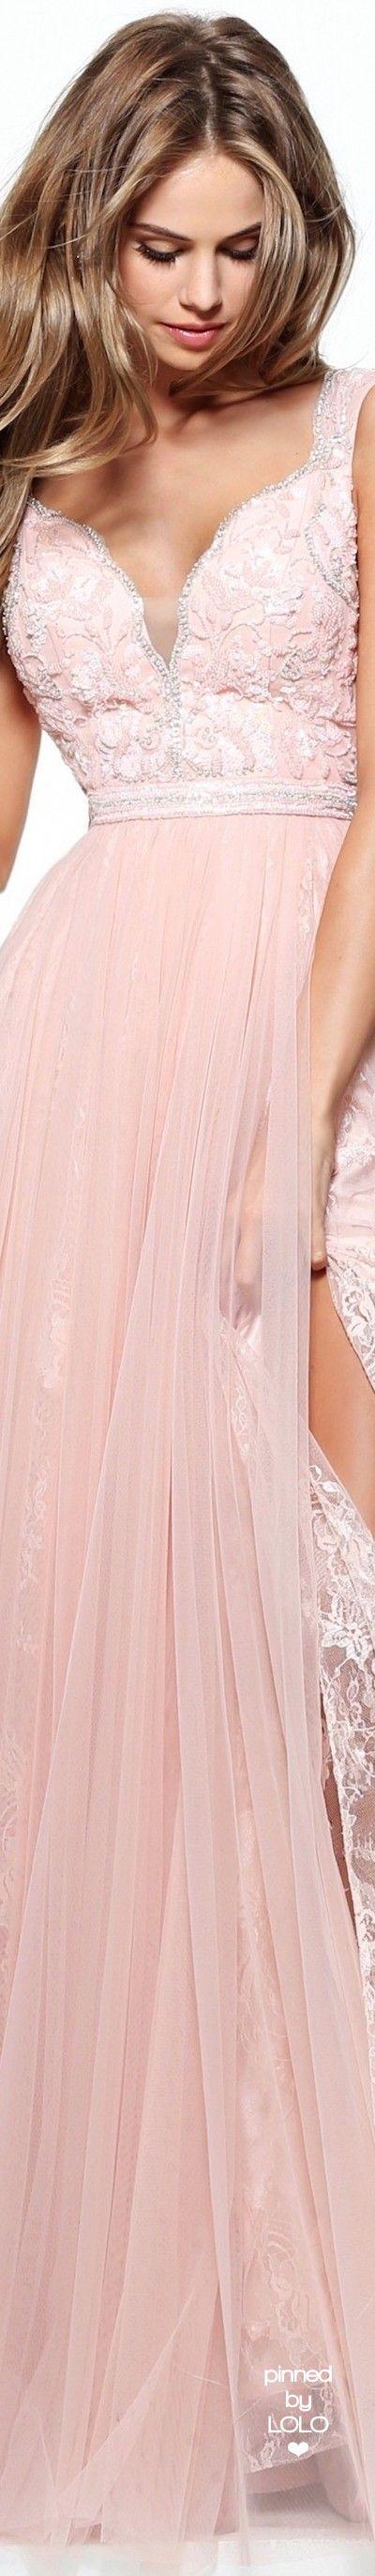 Pin de Jennifer Lupart en Evening Dresses | Pinterest | Color rosa ...